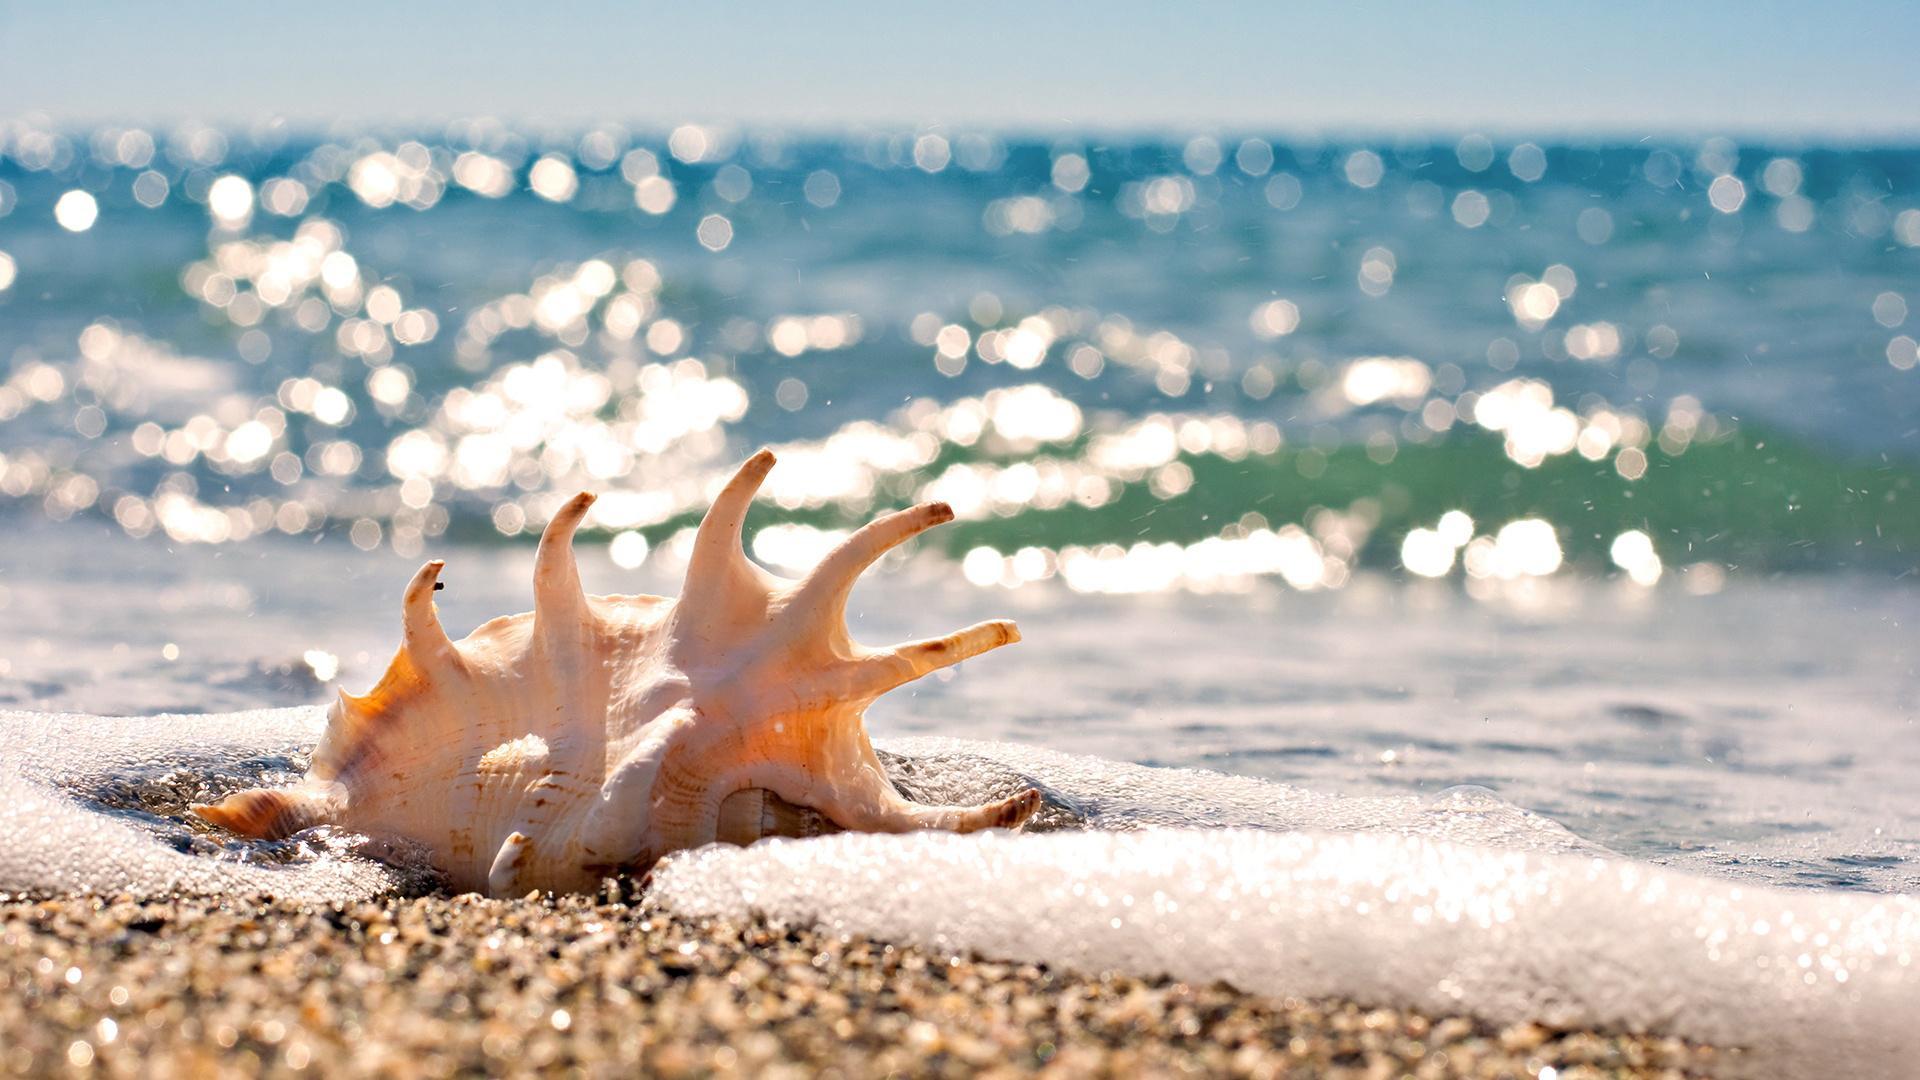 Darlene's Shells